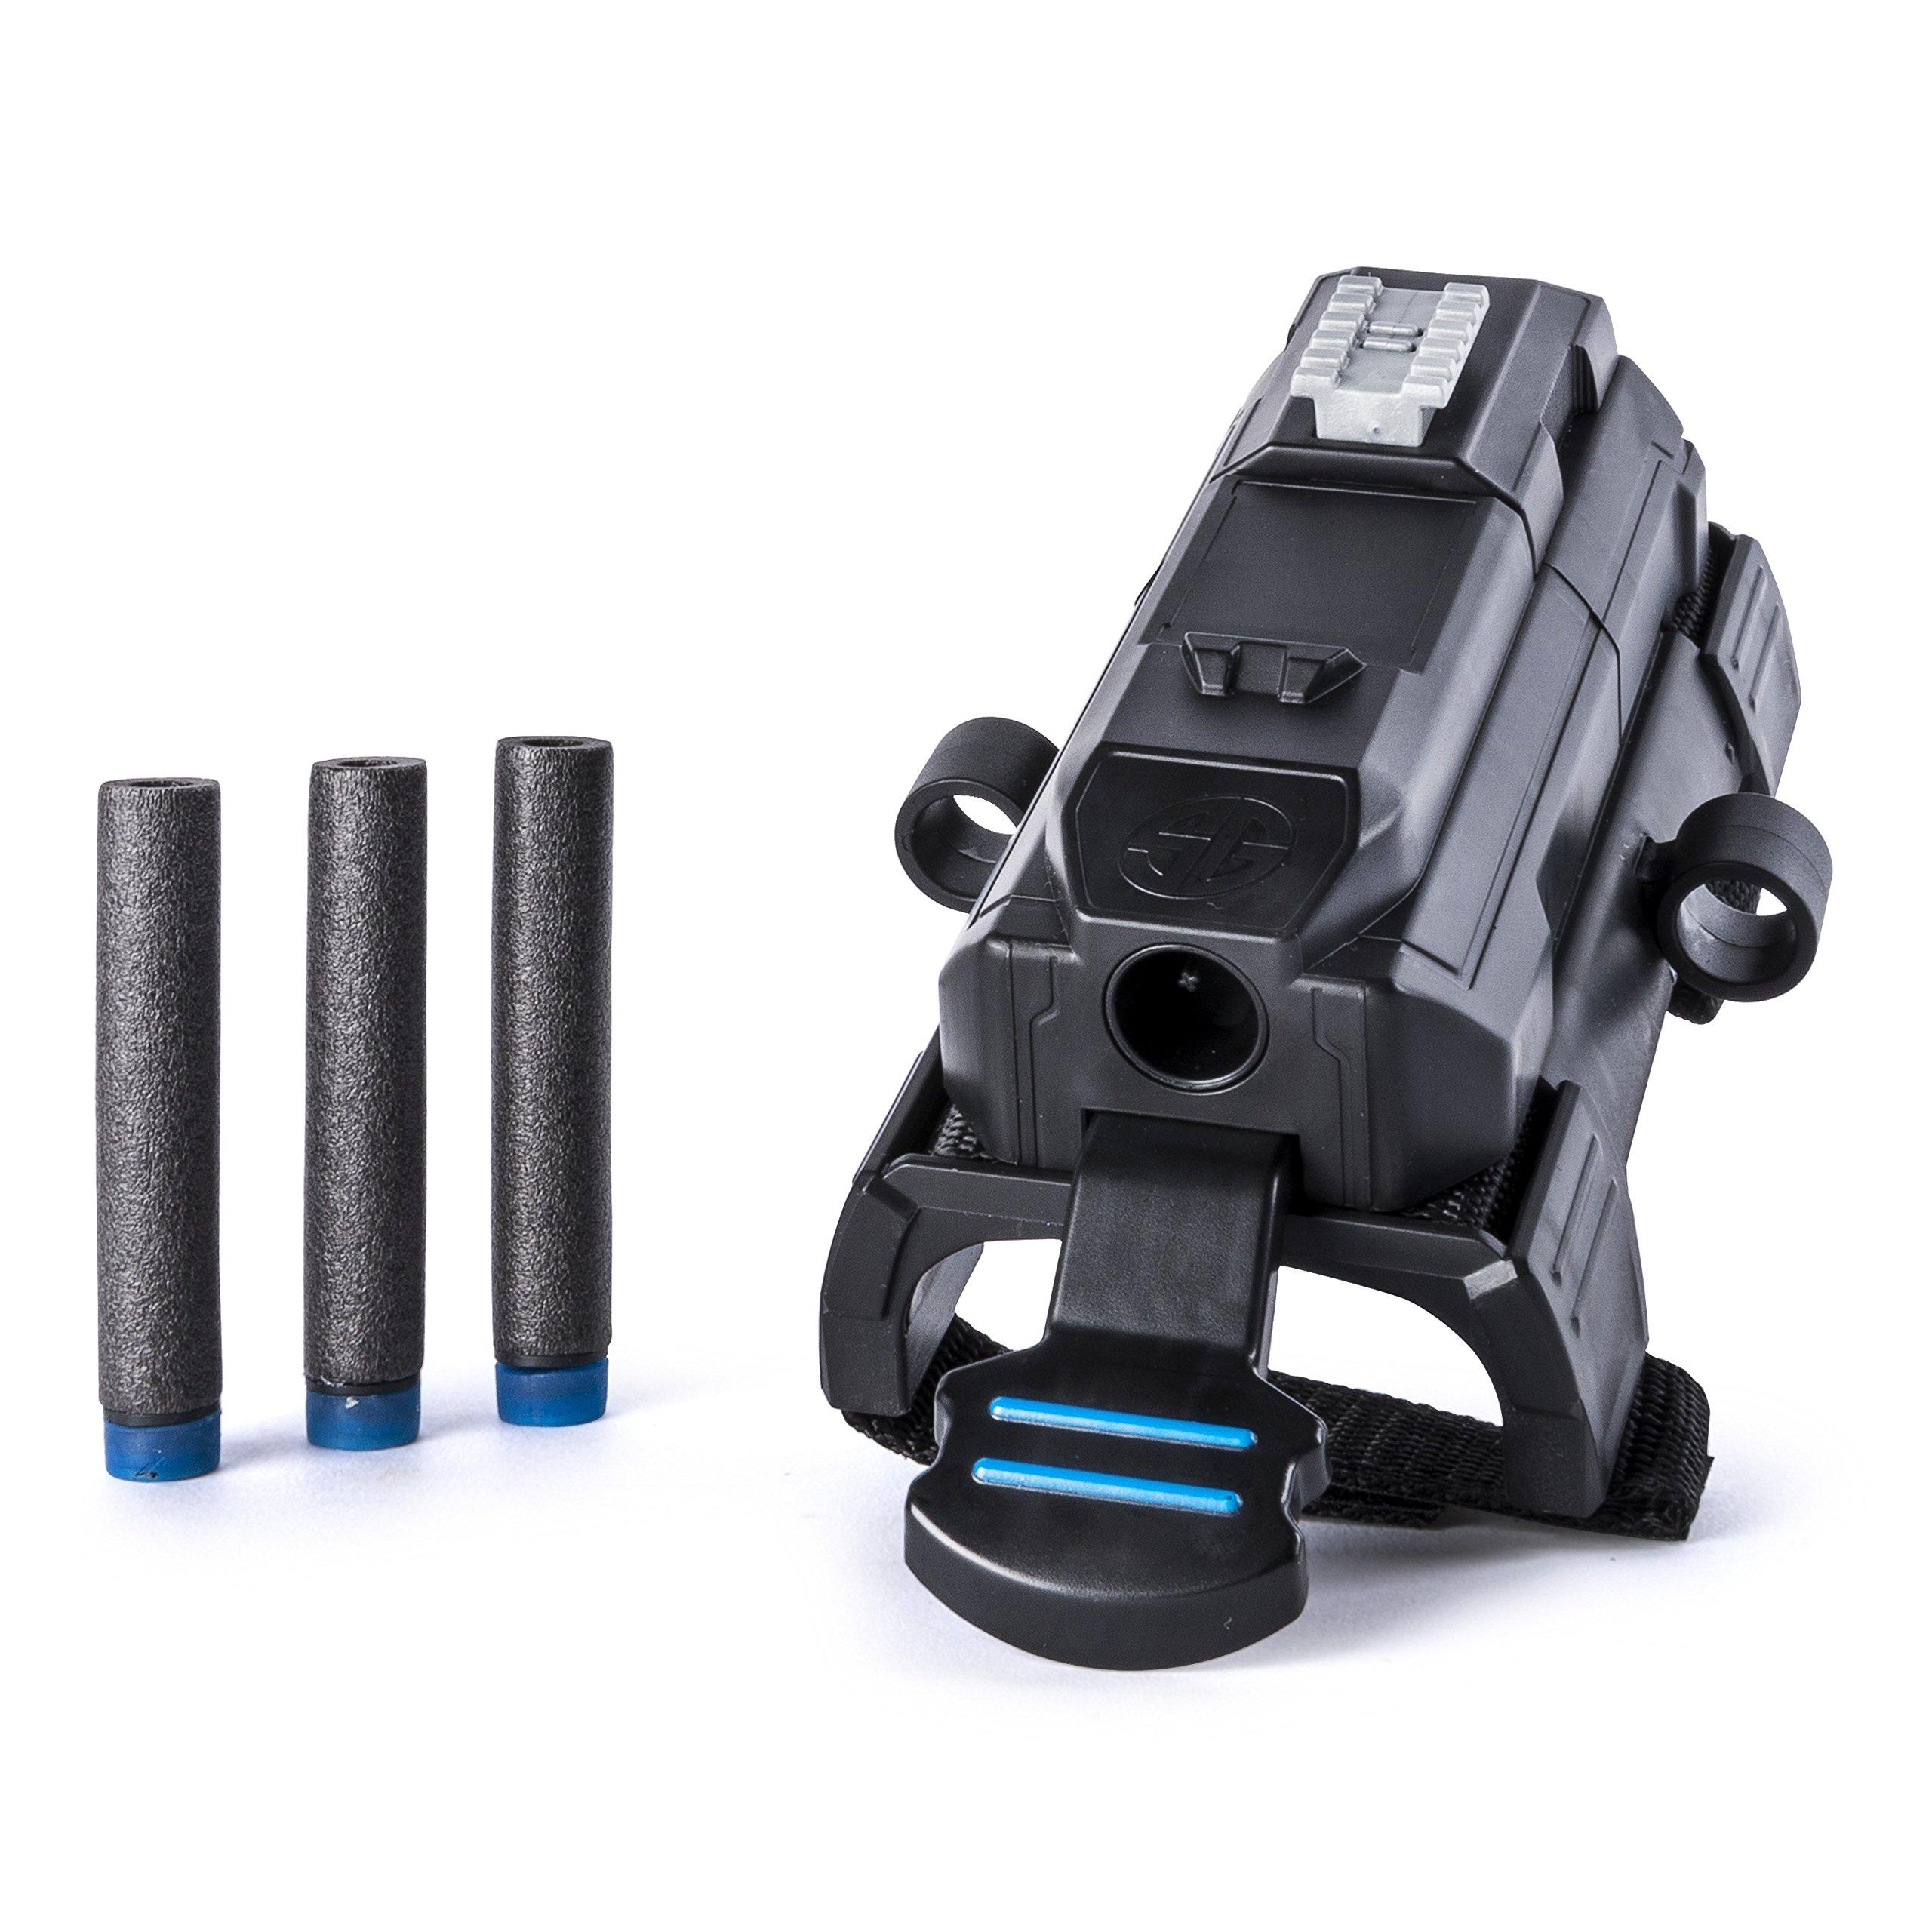 Spy Gear 6033009 Ninja Wrist Blaster by Spy Gear (Image #2)